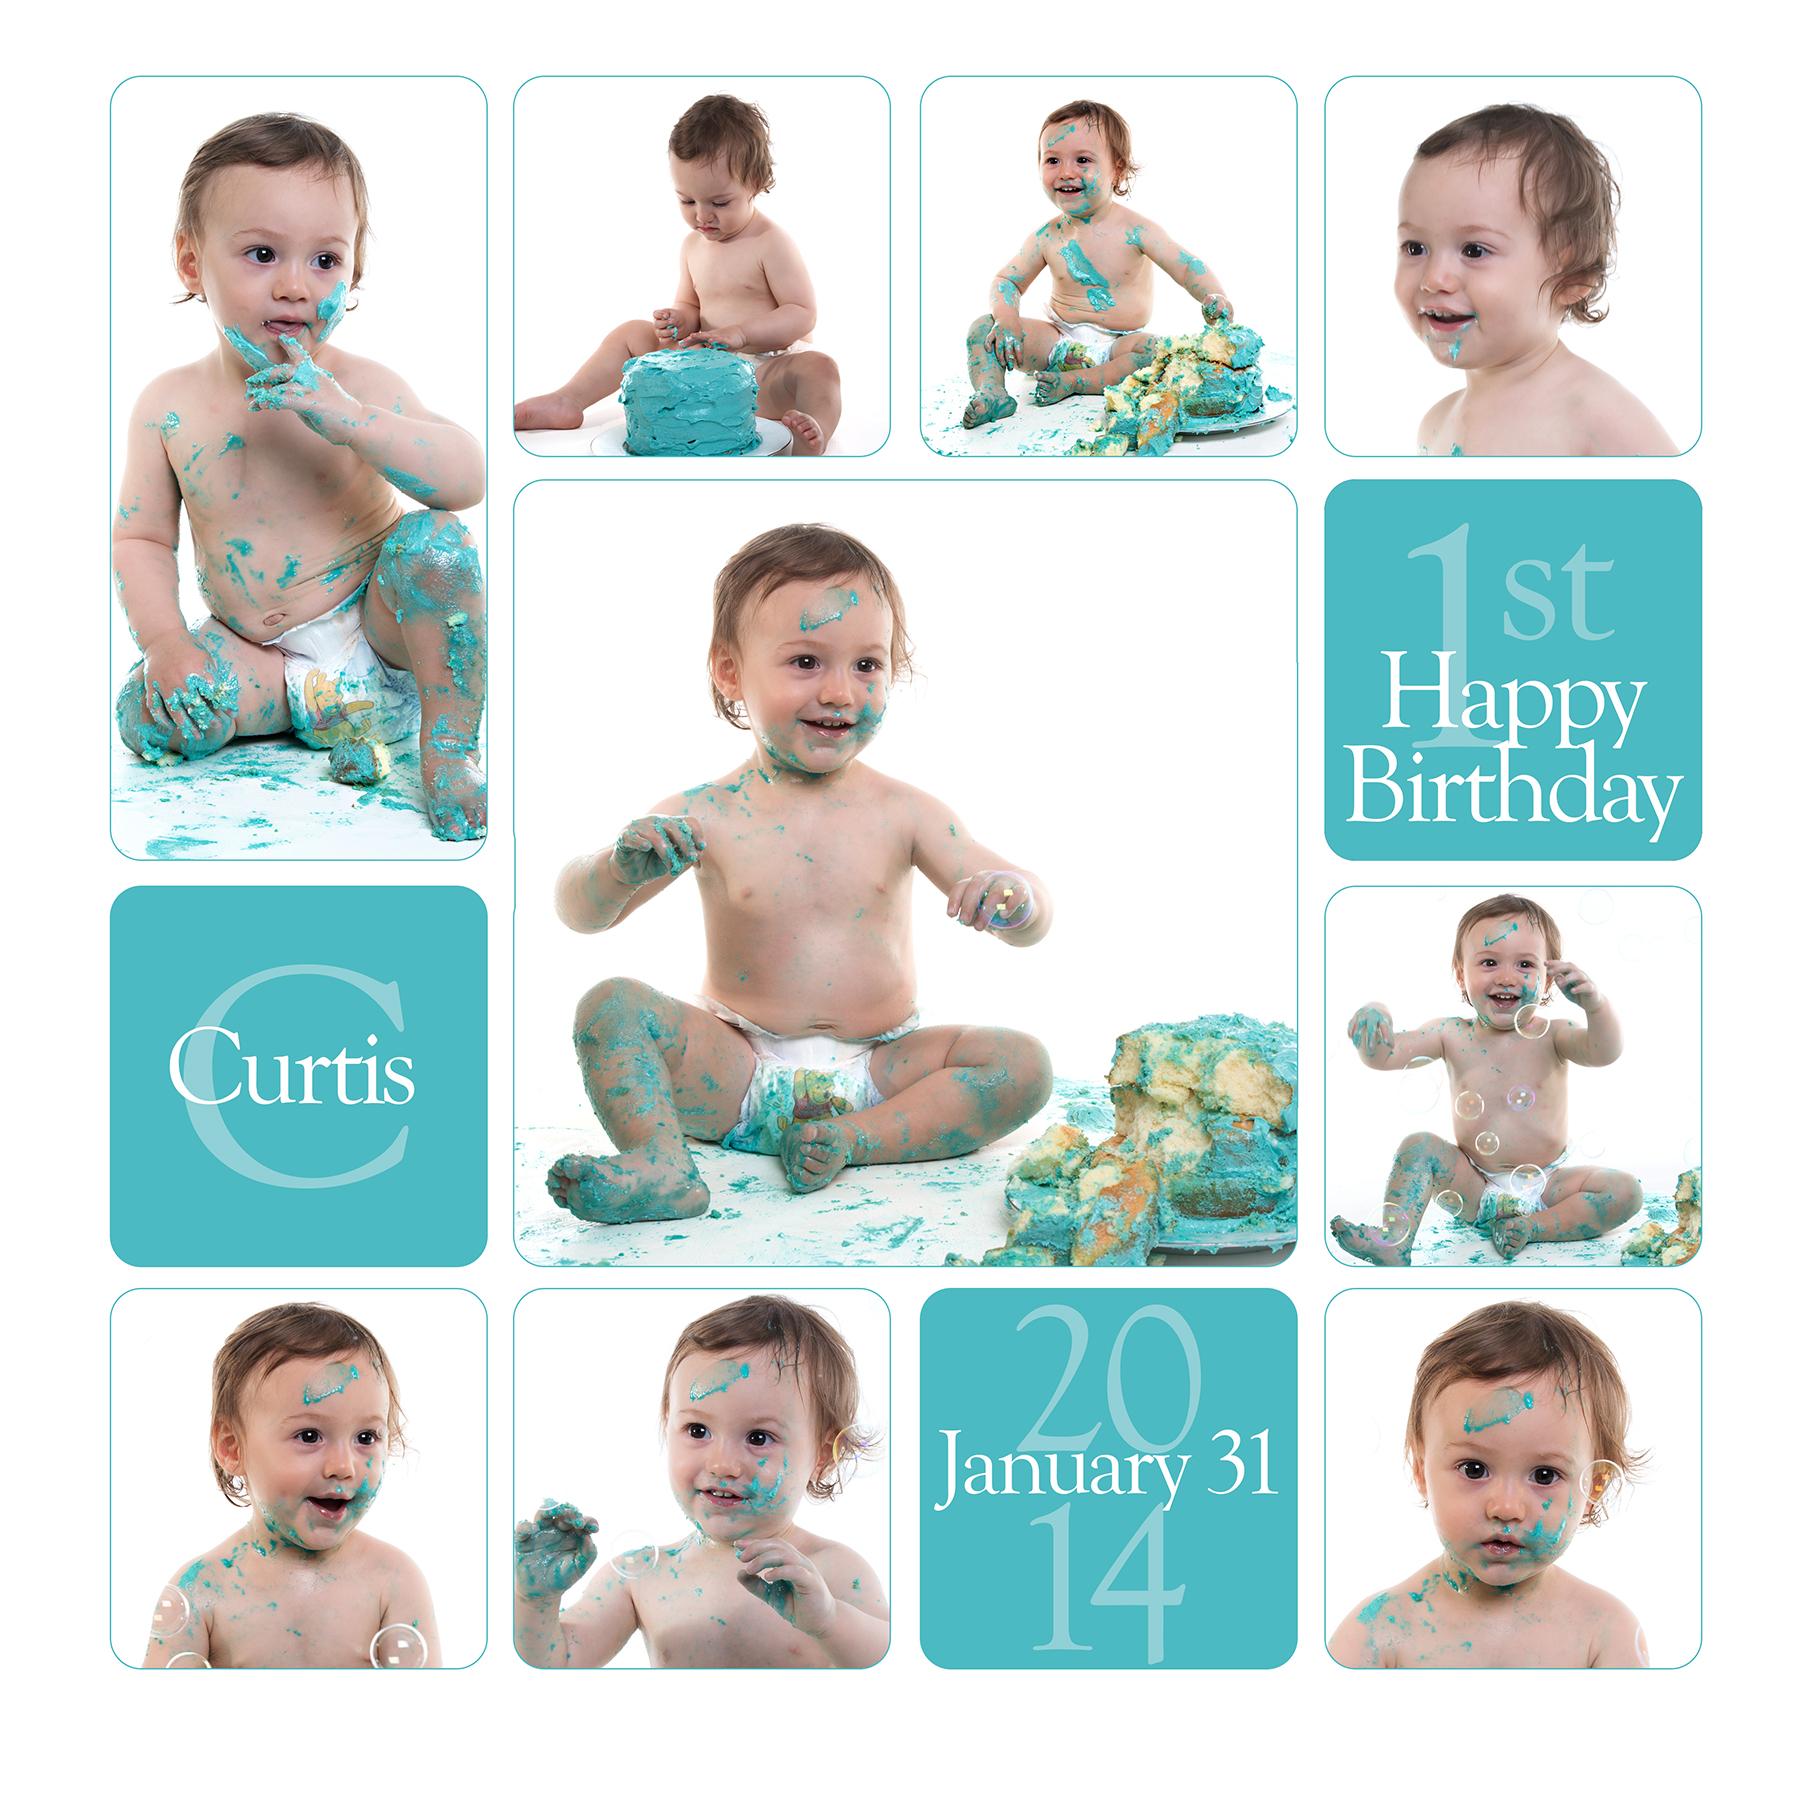 Cake Smash Collage - Cake Smash and First Birthday Photos Geelong